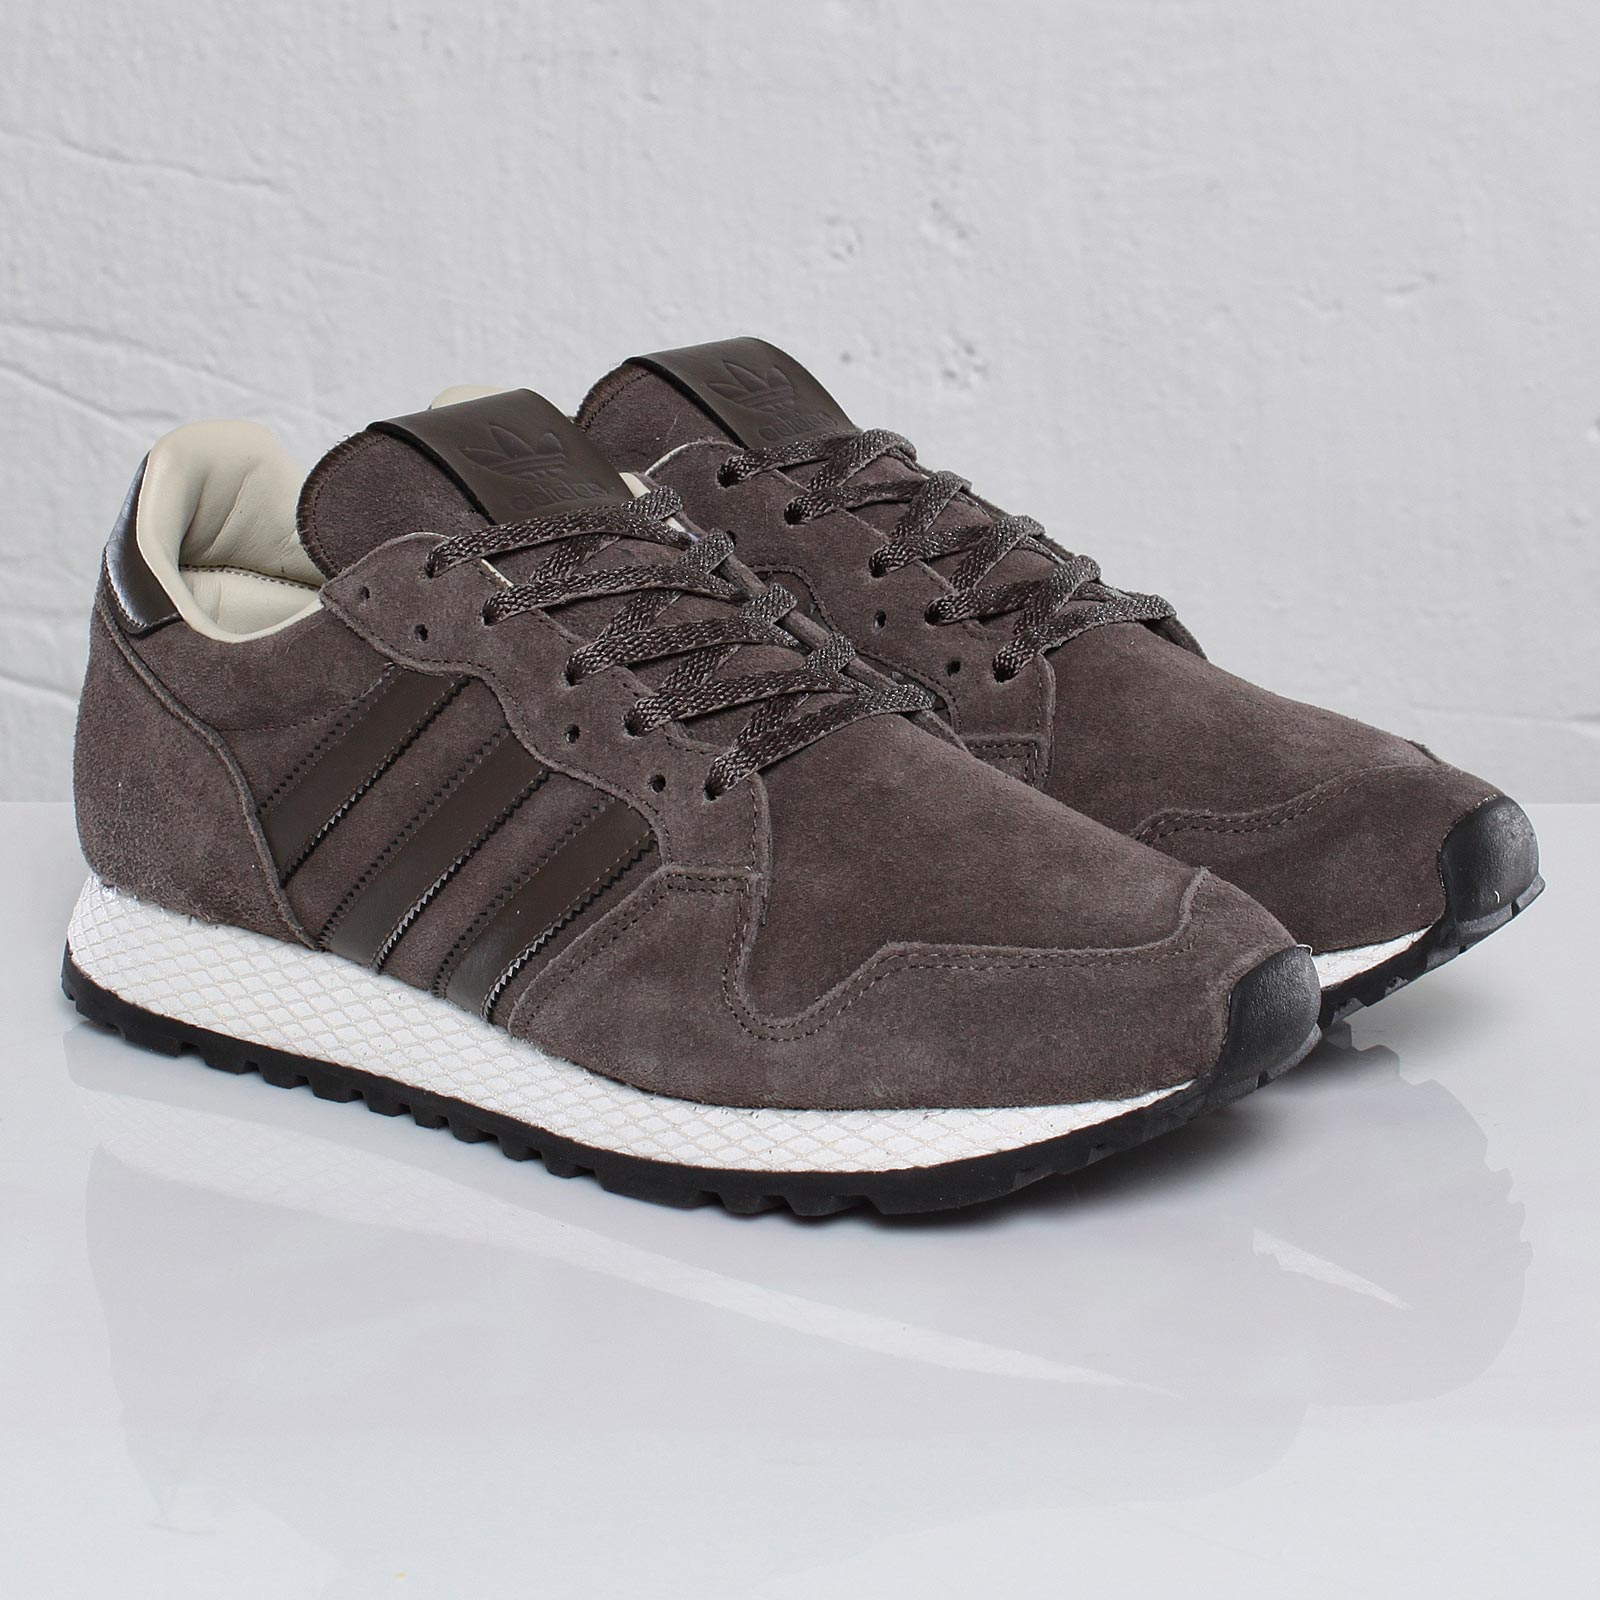 low priced 3dfcd a9892 adidas ZX 380 - 101185 - Sneakersnstuff   sneakers   streetwear ...